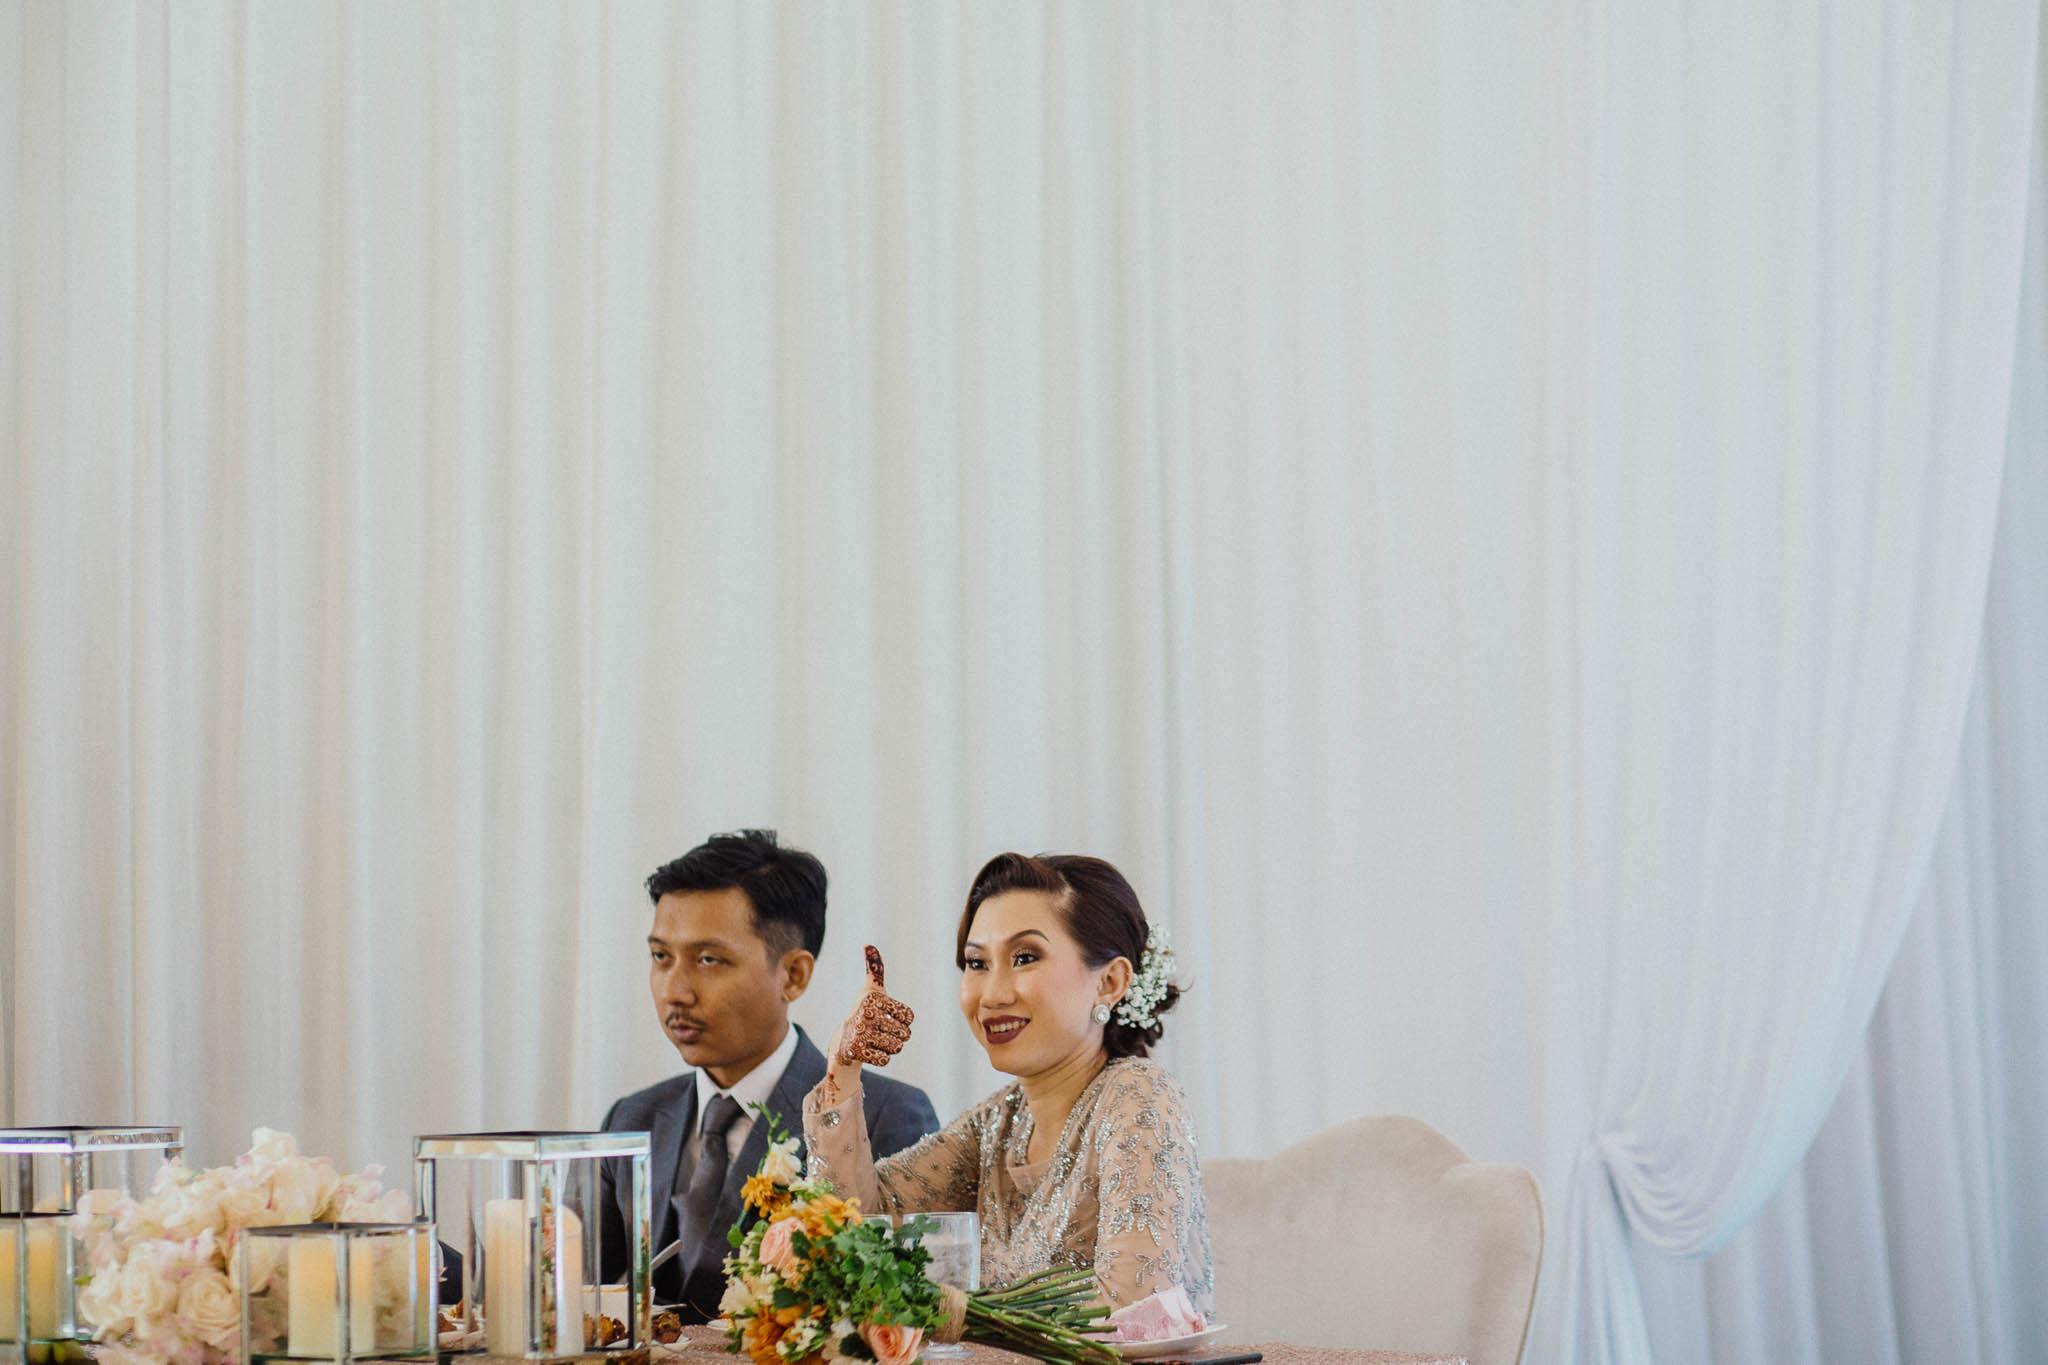 singapore-wedding-photographer-addafiq-nufail-063.jpg